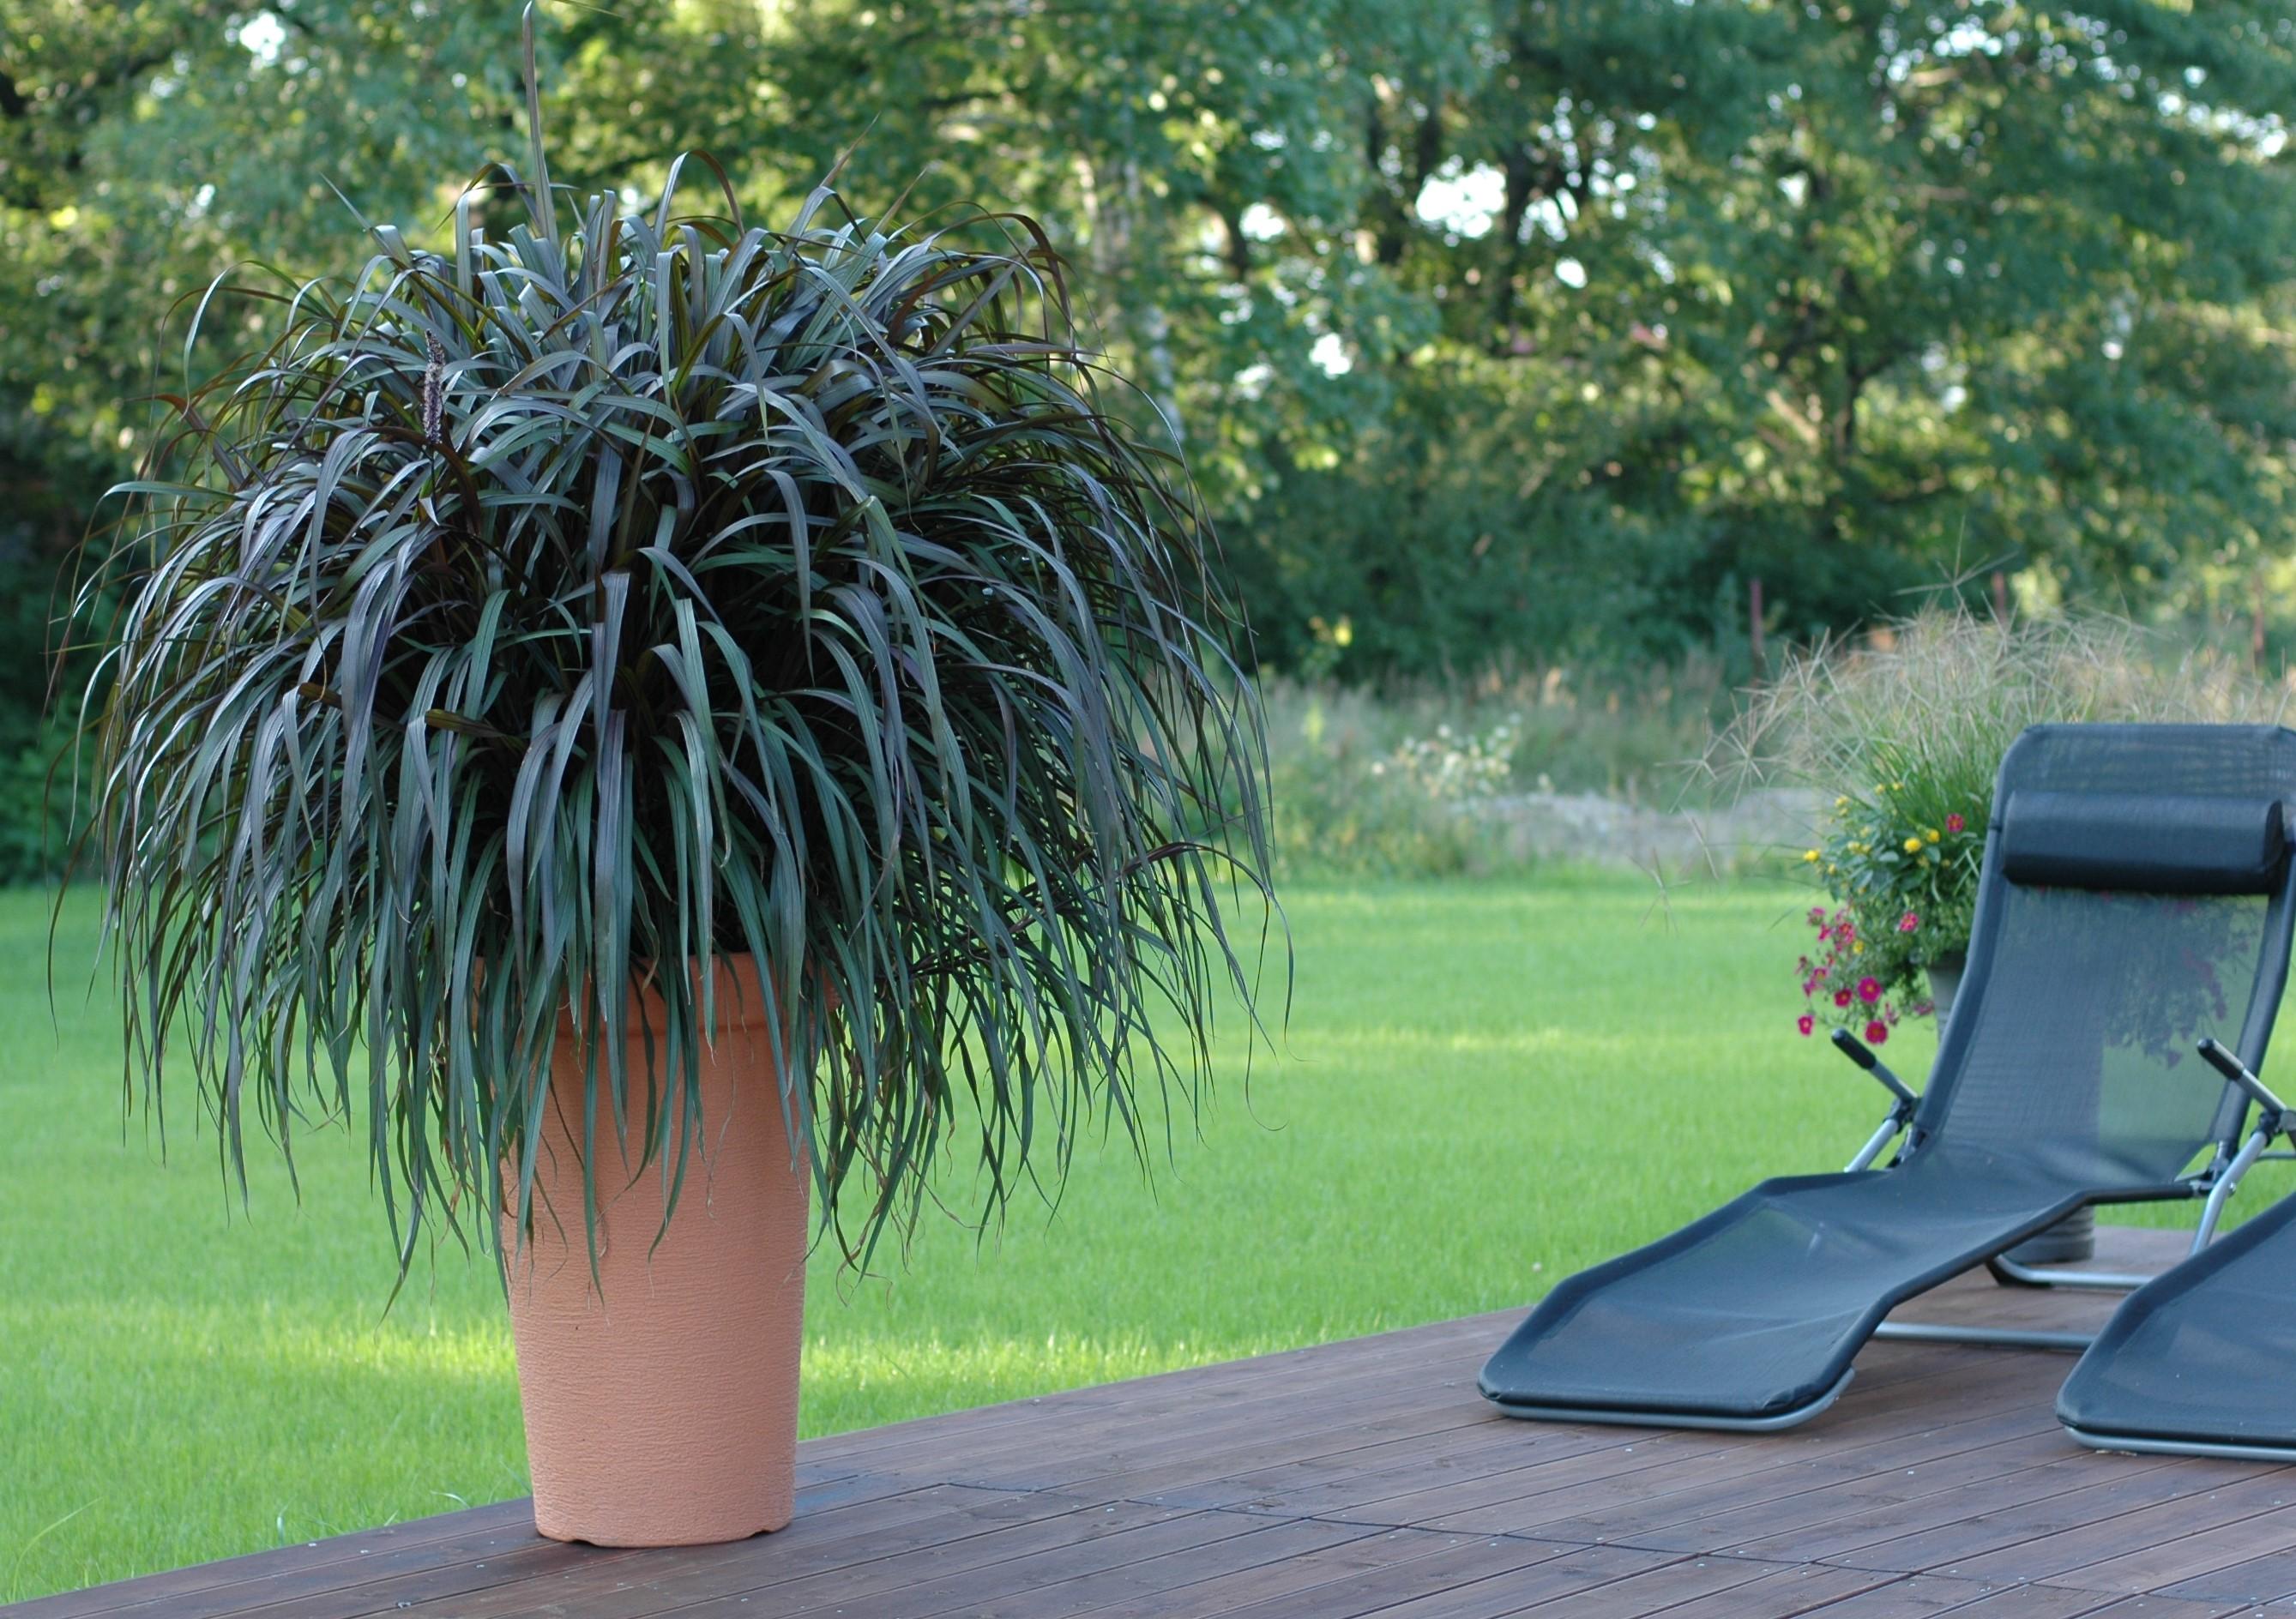 Trawa ozdobna - Vertigo (Pennisetum purpureum)